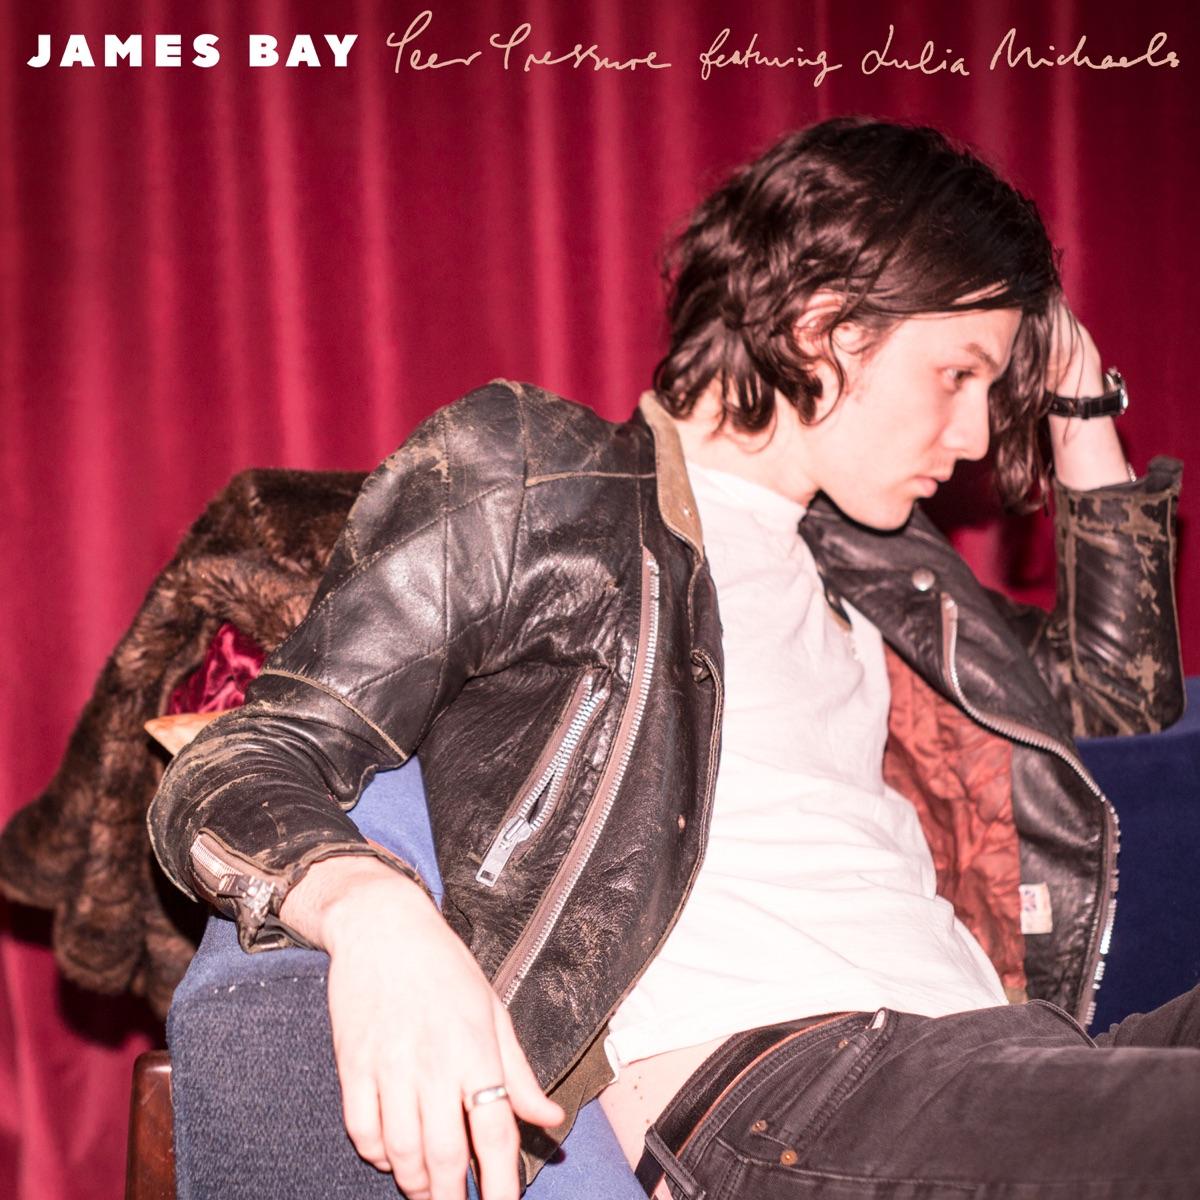 Peer Pressure feat Julia Michaels - Single James Bay CD cover